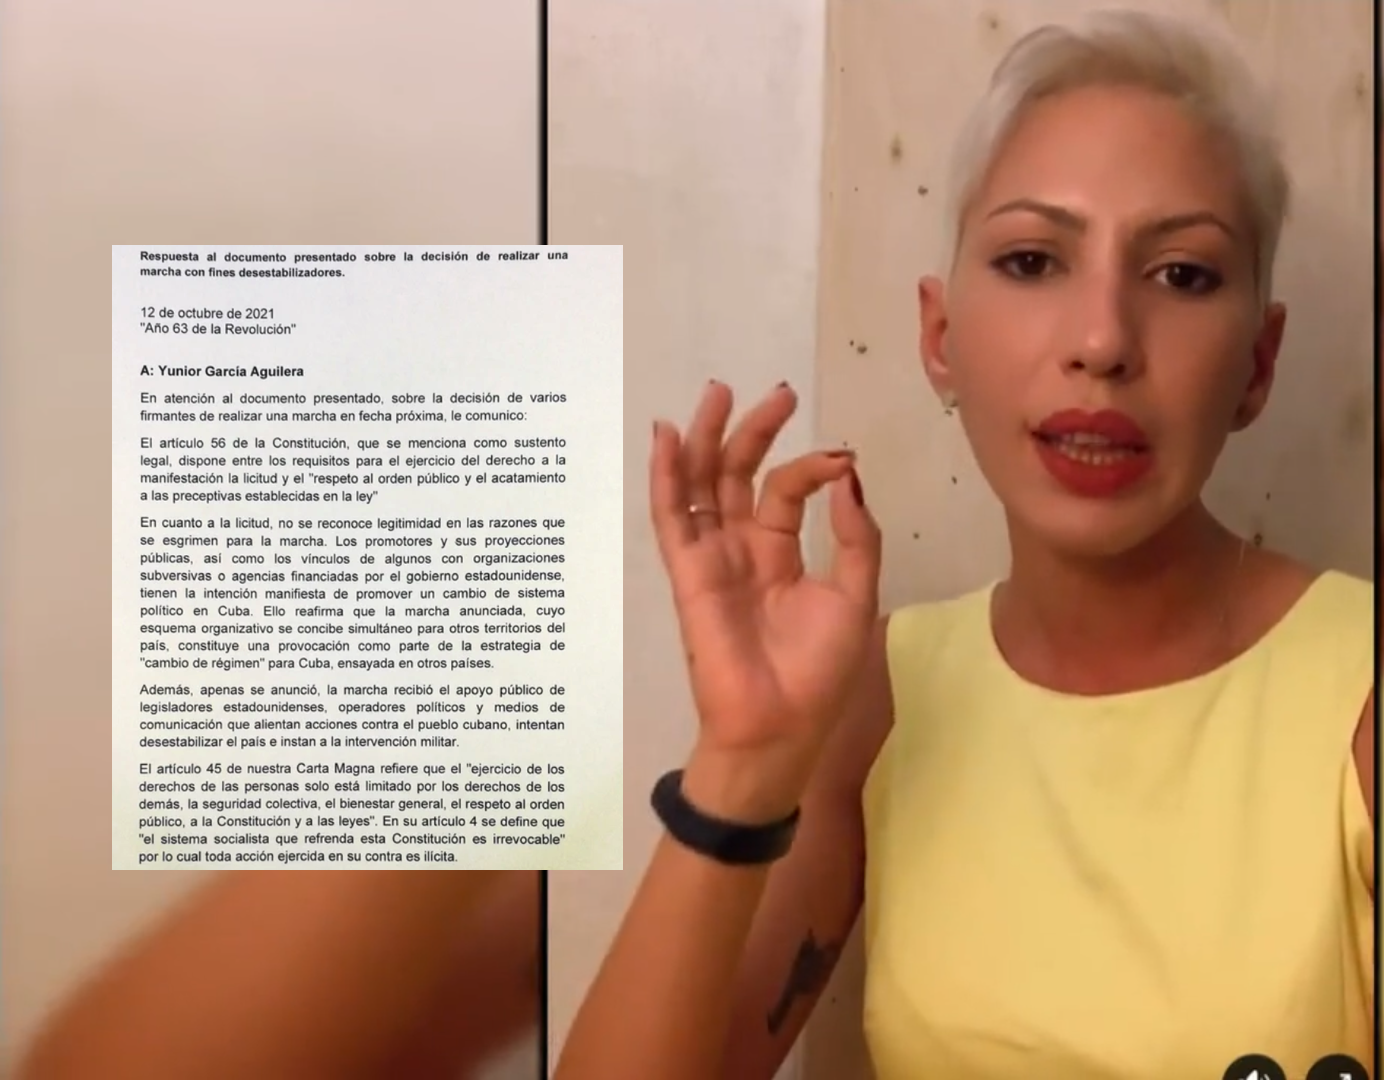 Promotores de la marcha del 15 de noviembre toman decisión de salir a marchar a pesar de negativa del régimen cubano